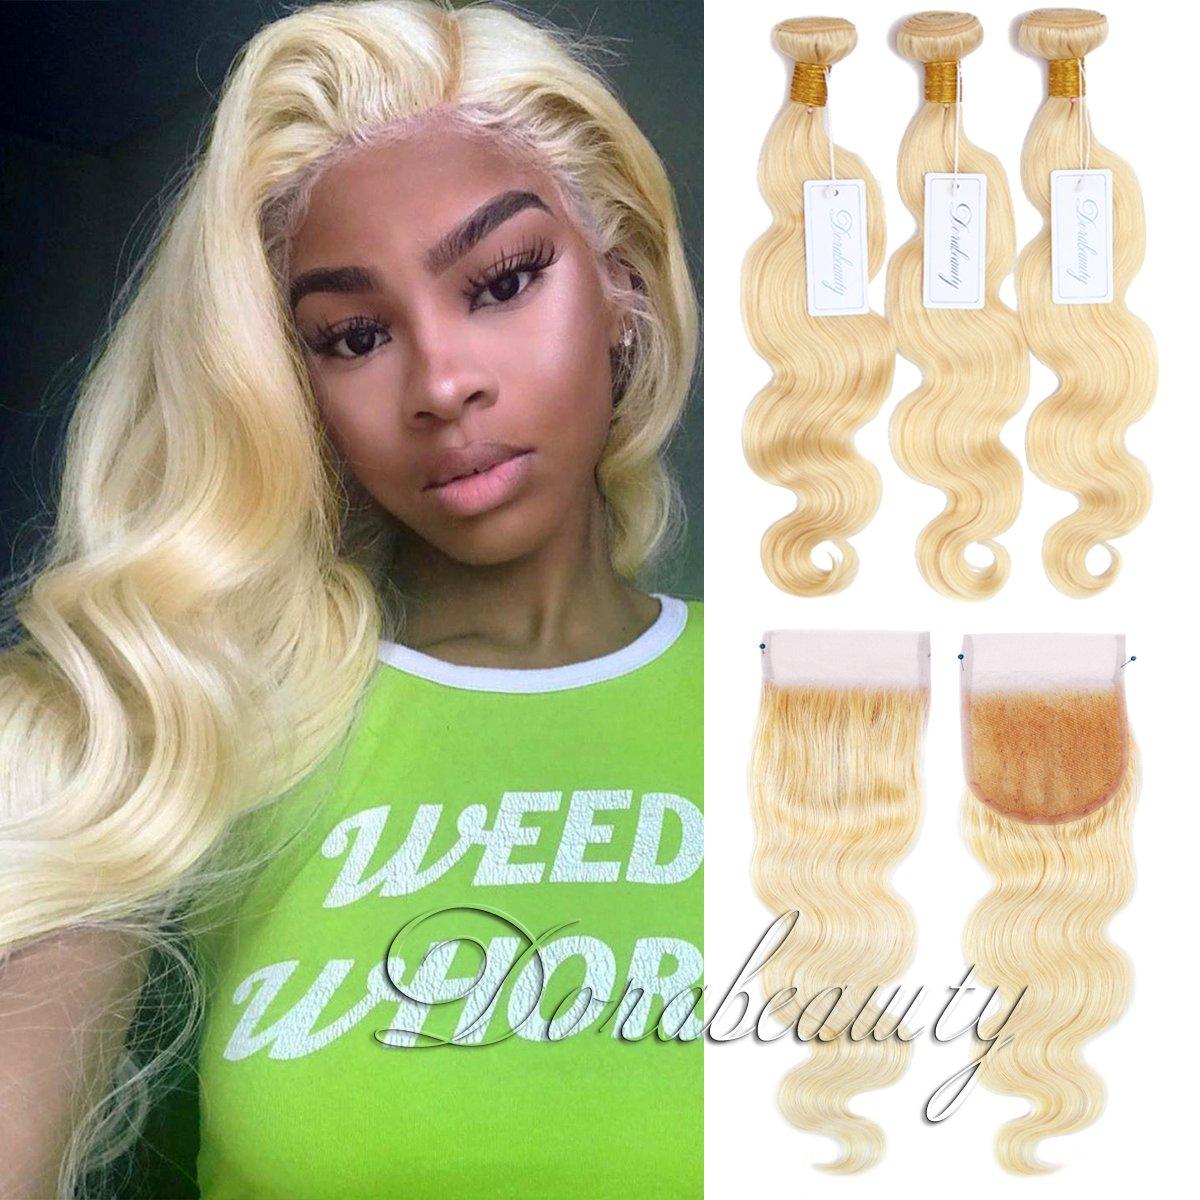 Amazon Dorabeauty 613 Blonde Human Hair Bundles With Closure